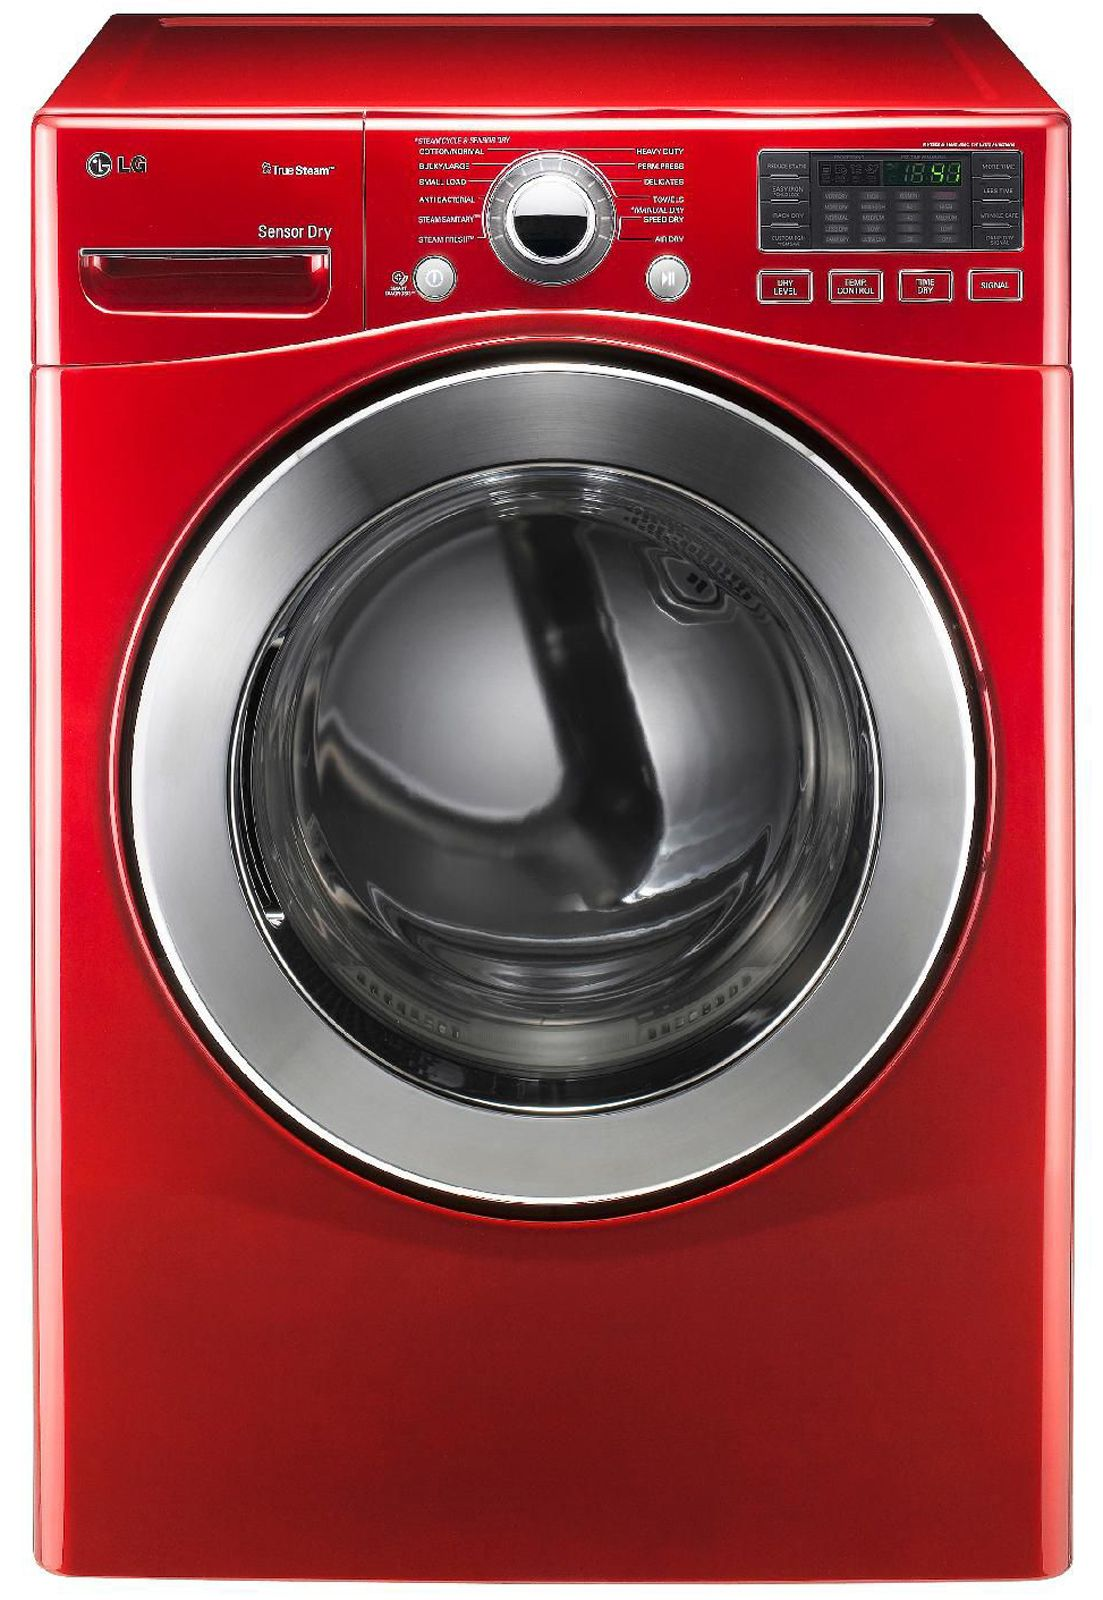 Lg 73 cu ft steam electric dryer w sensor dry red